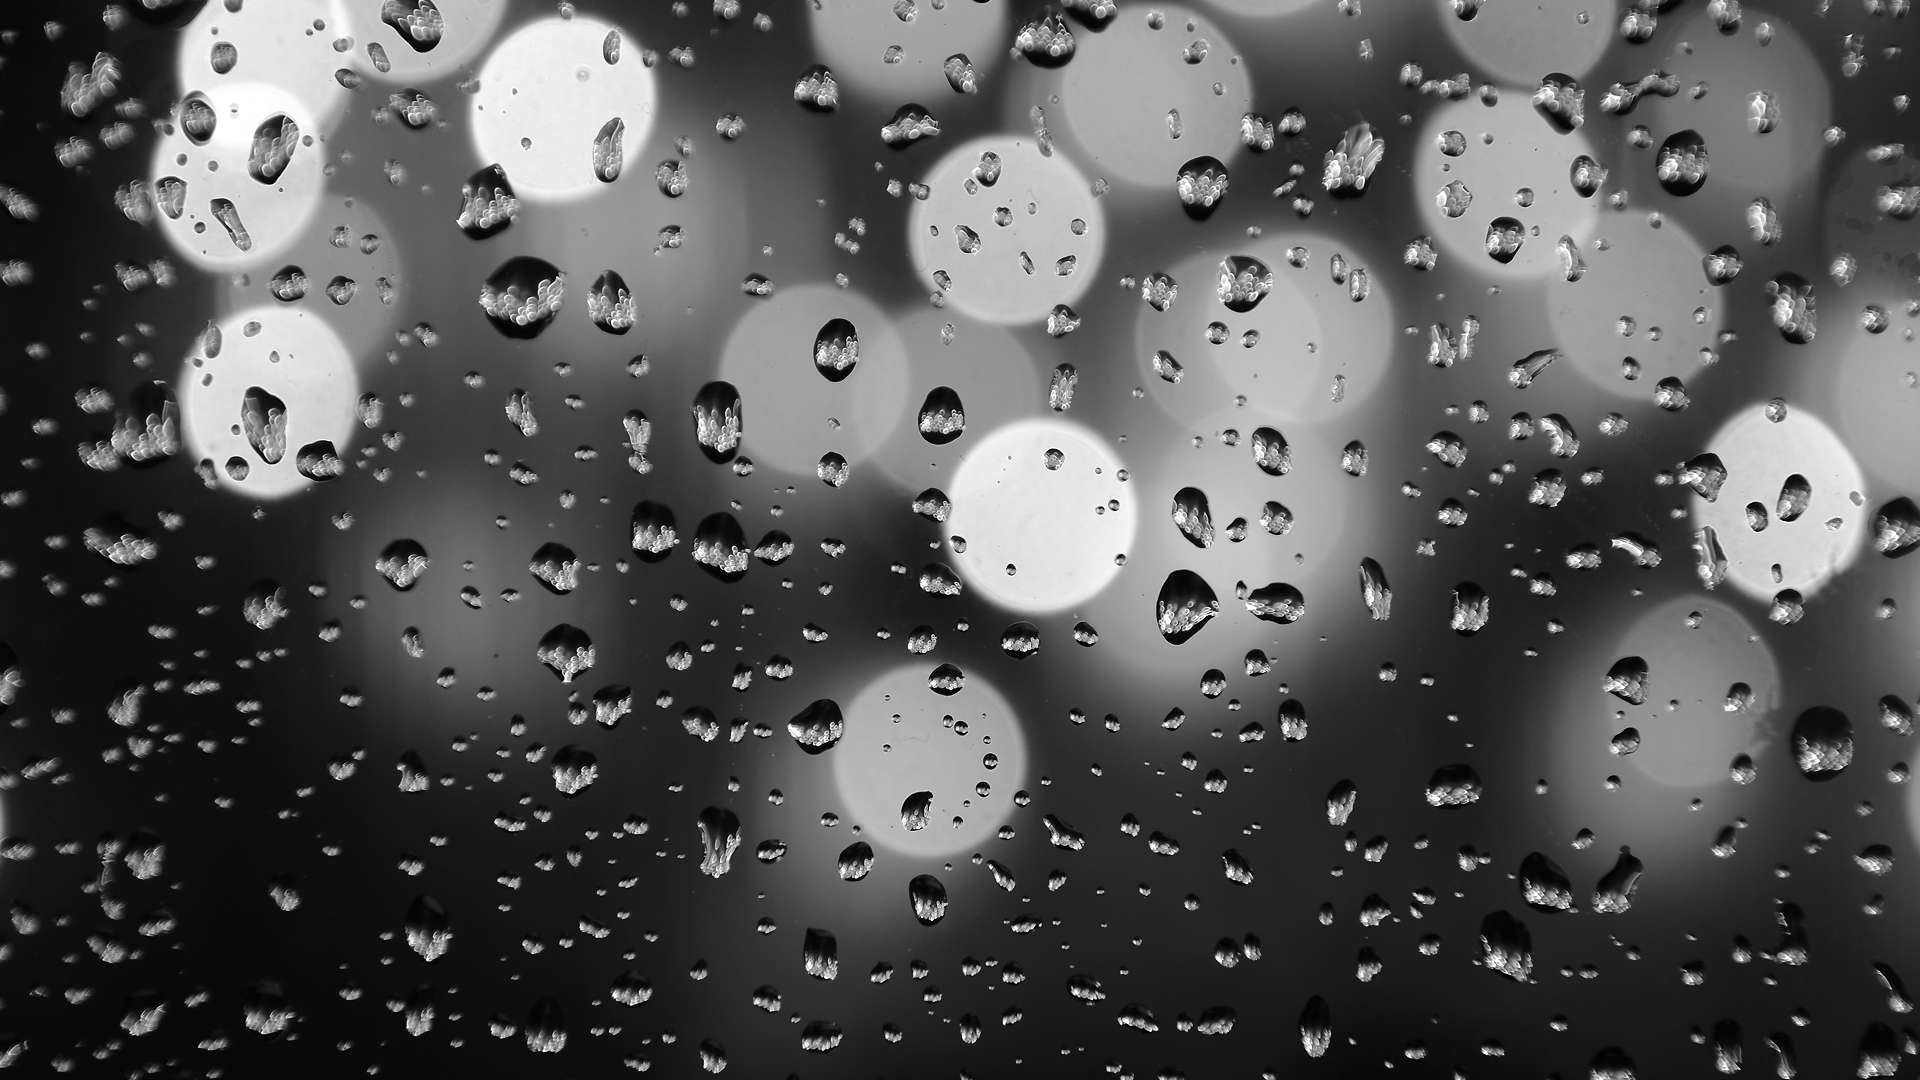 Raindrop Wallpaper Iphone X Download Black And White Rain Wallpaper Photo I8s0j